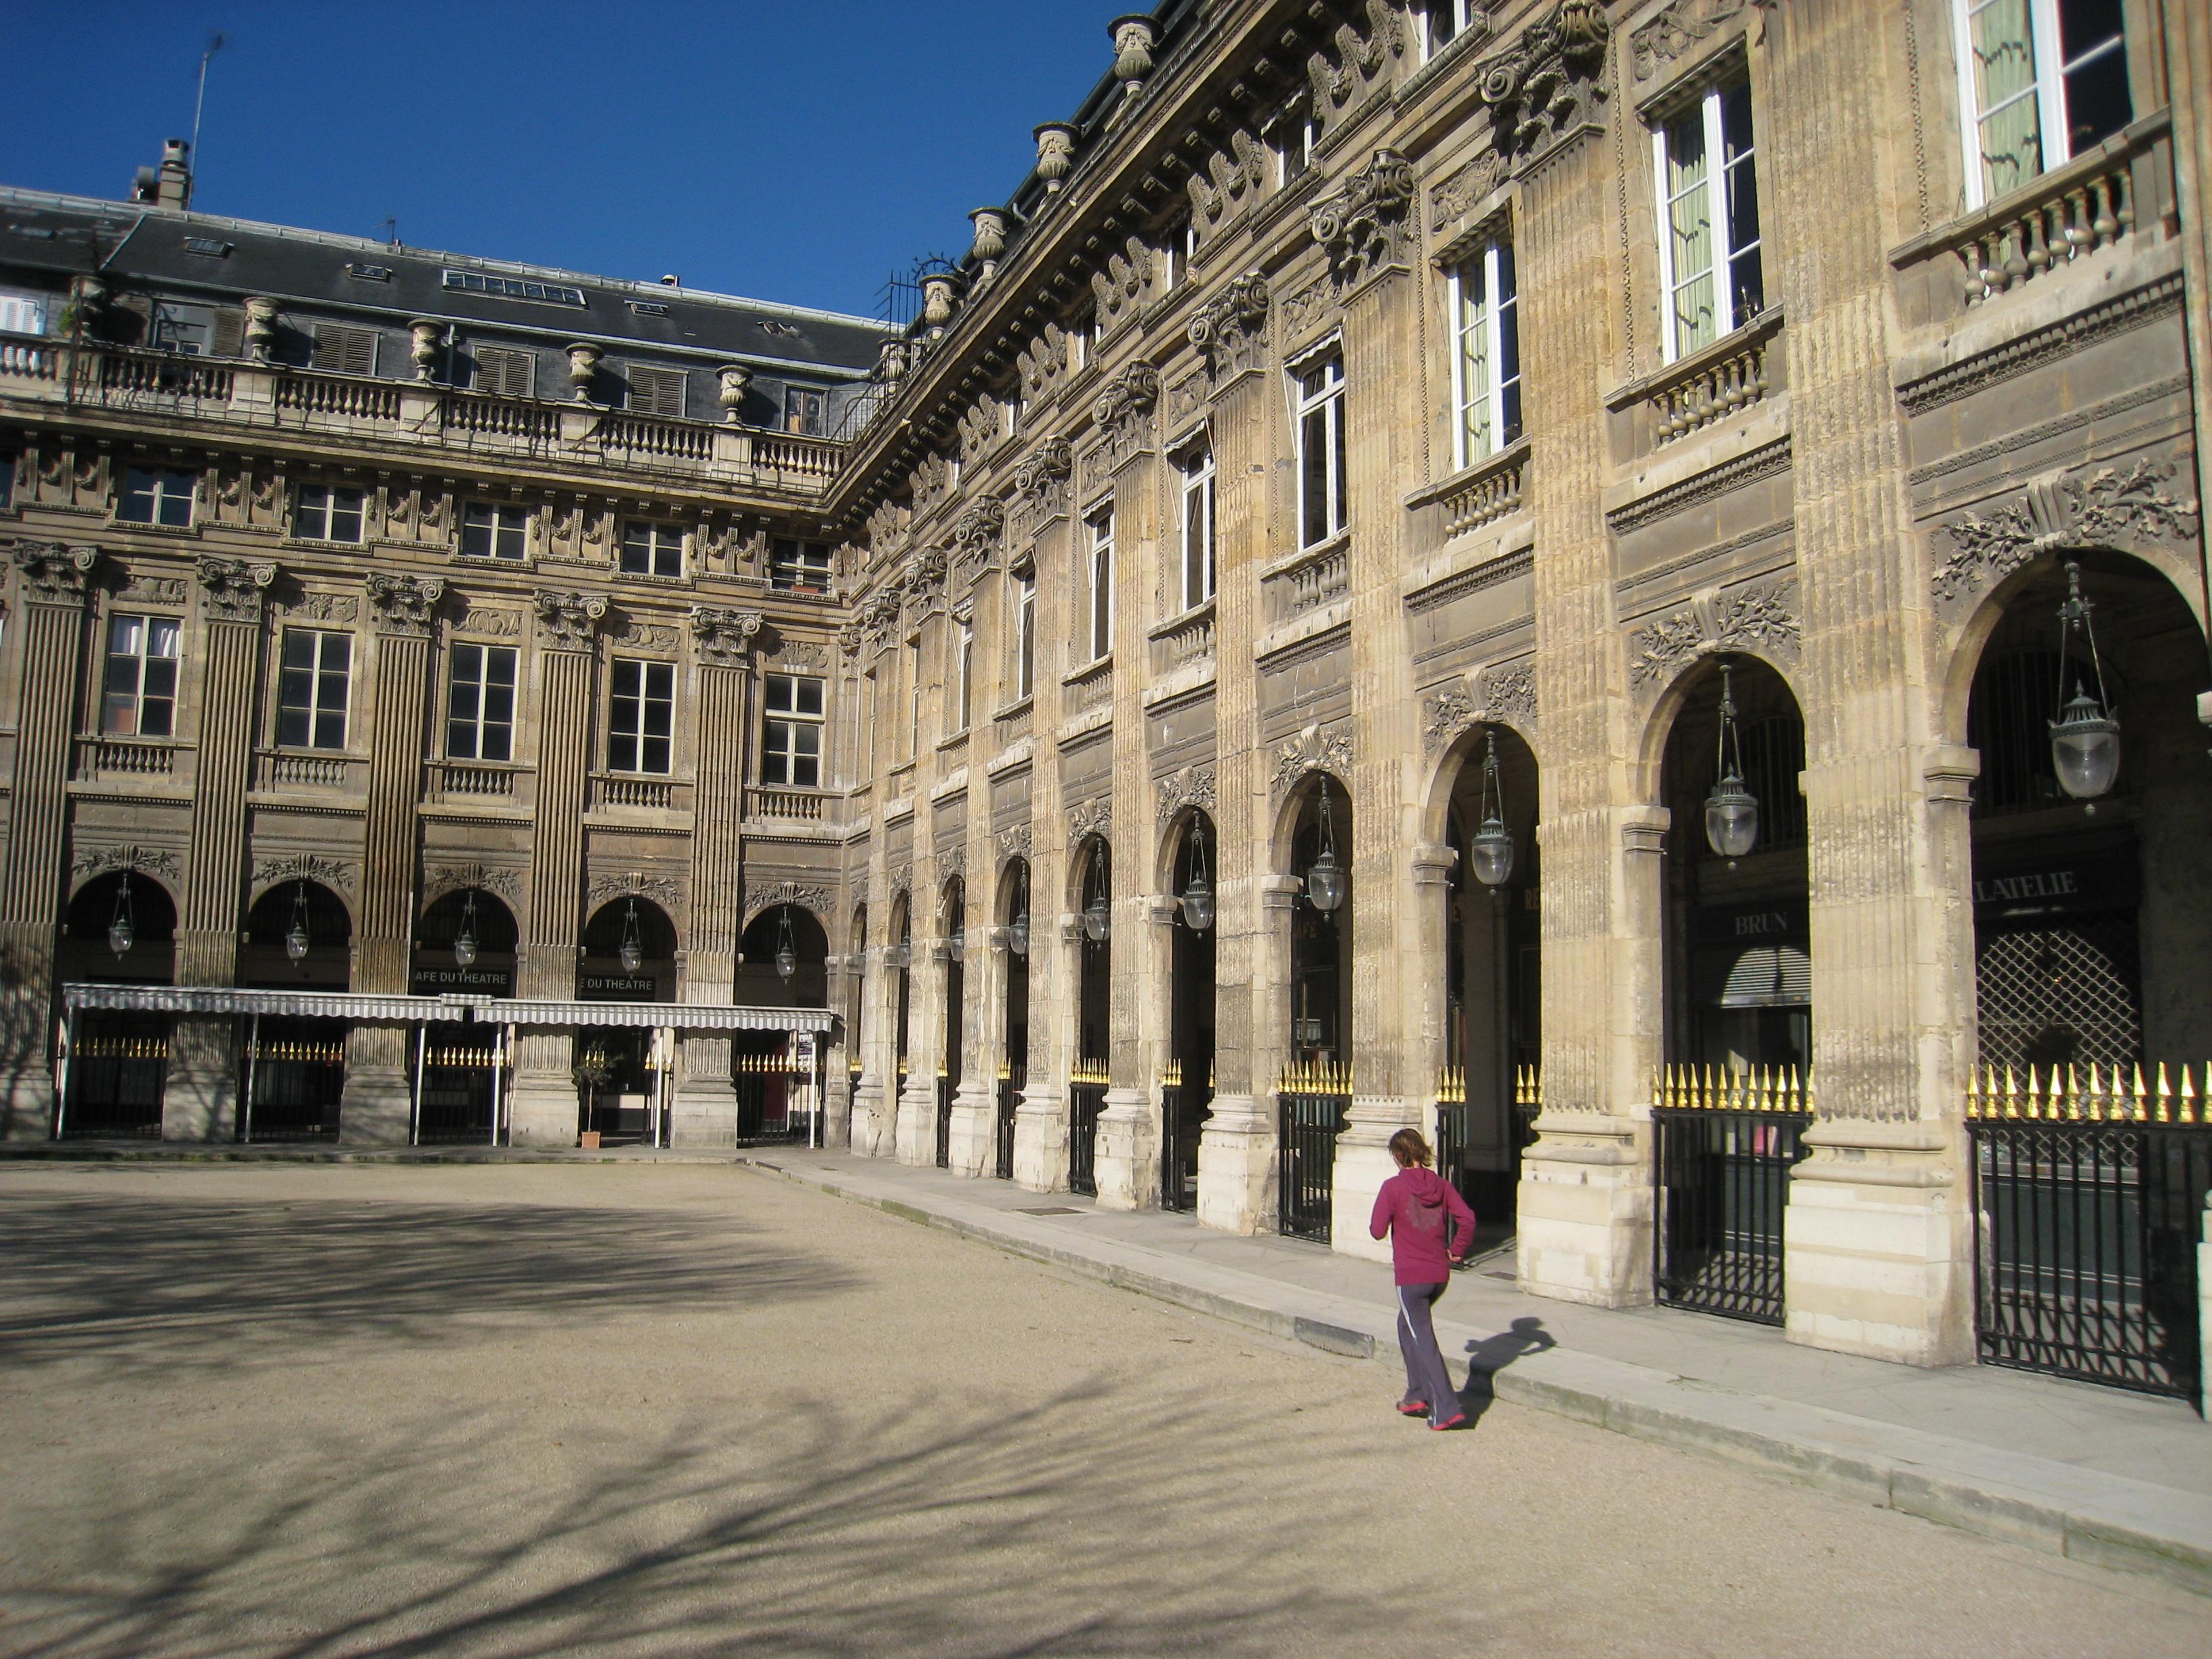 FilePalais Royal Paris interior courtyard detailJPG